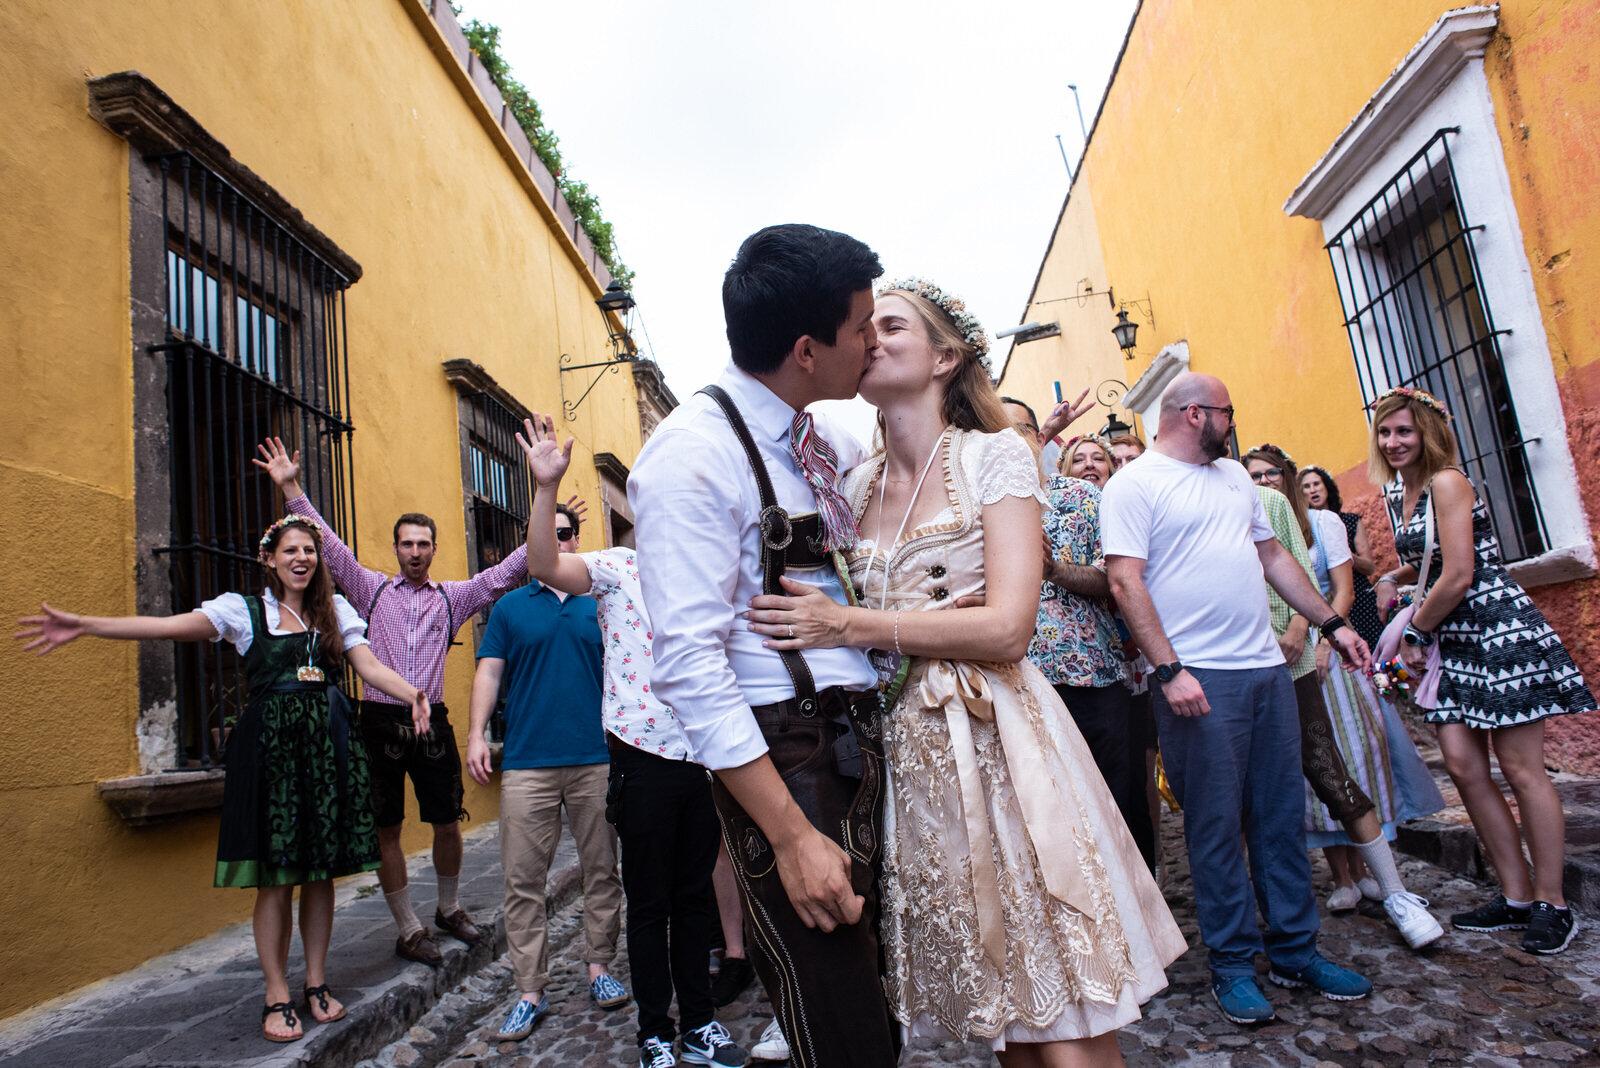 callejoneada_san_miguel_de_allende_wedding_photography_ (6).jpg